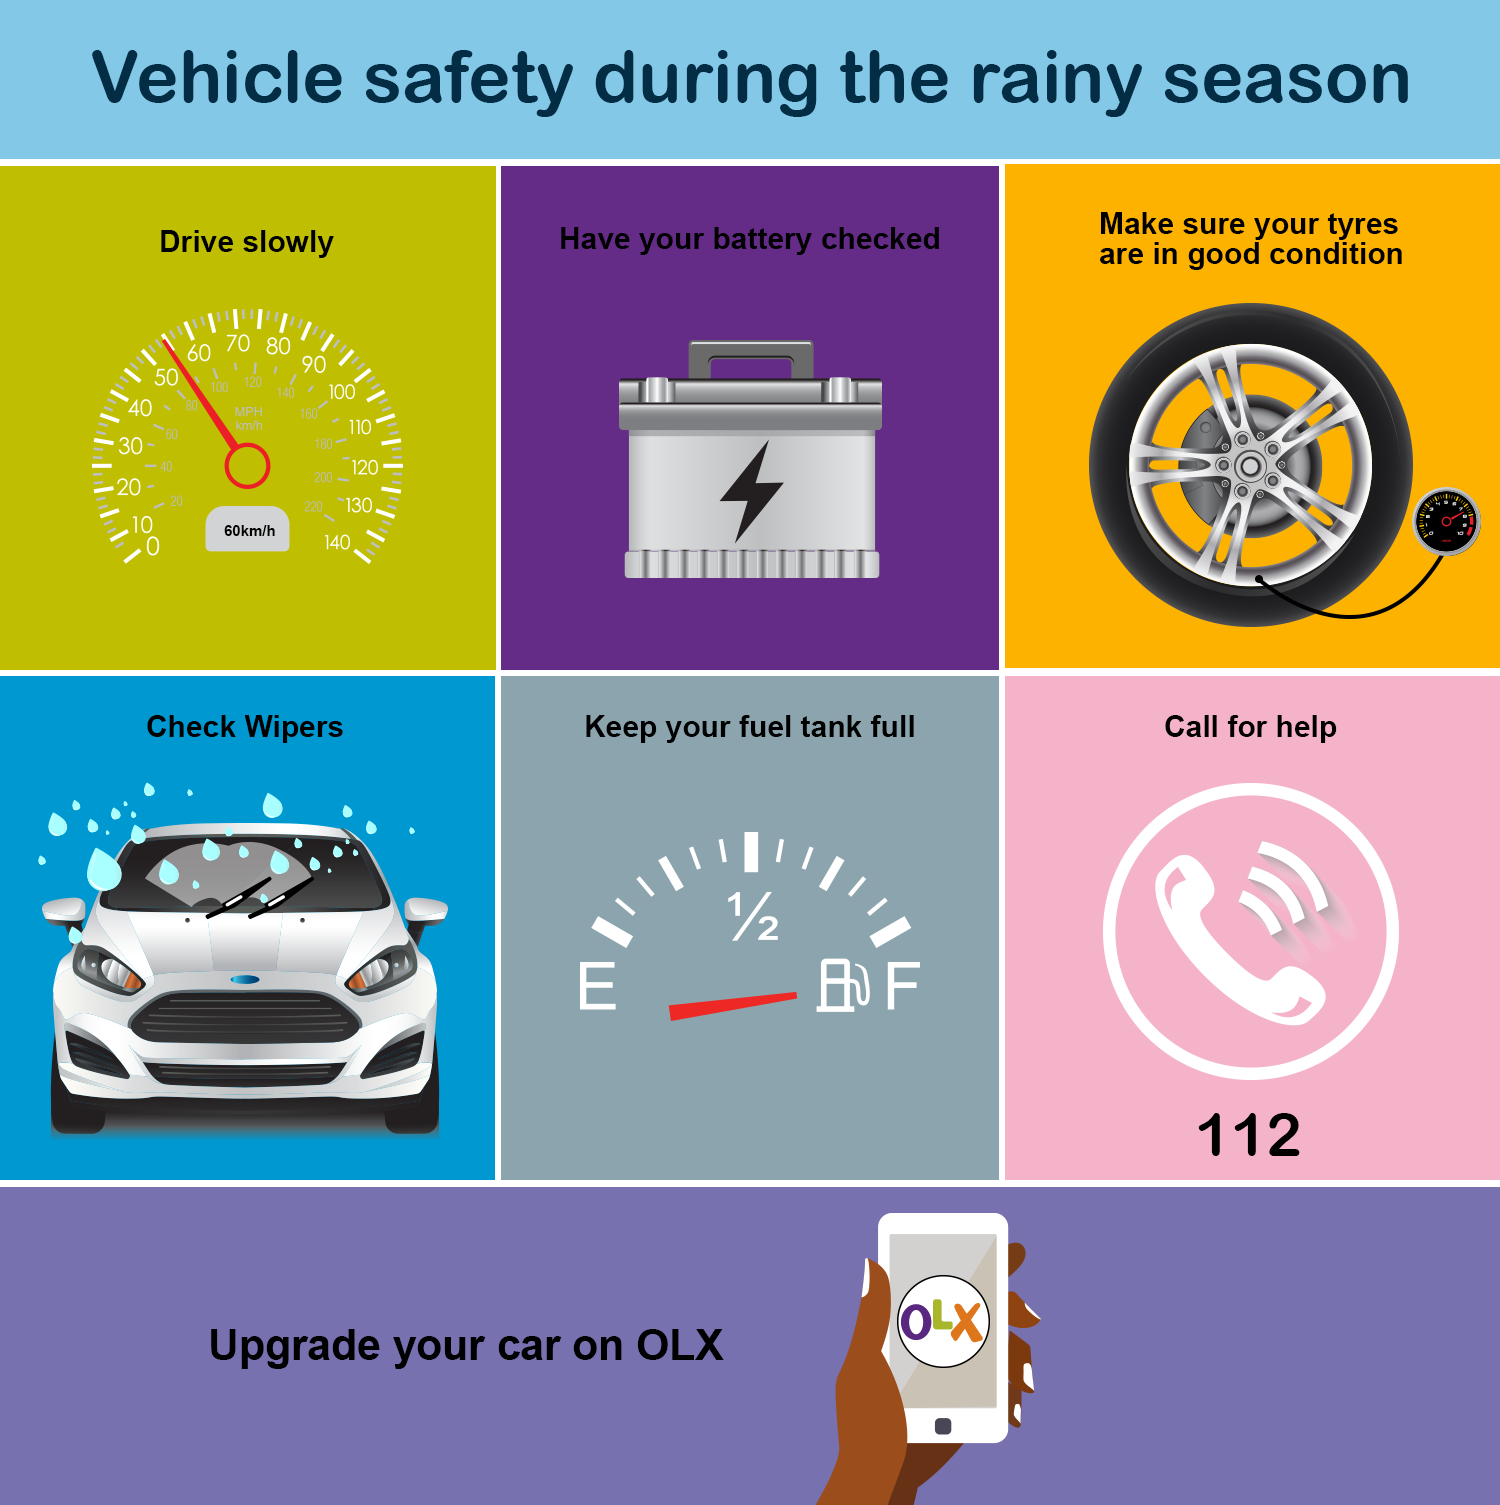 OLX seeks vehicle safety in rainy season